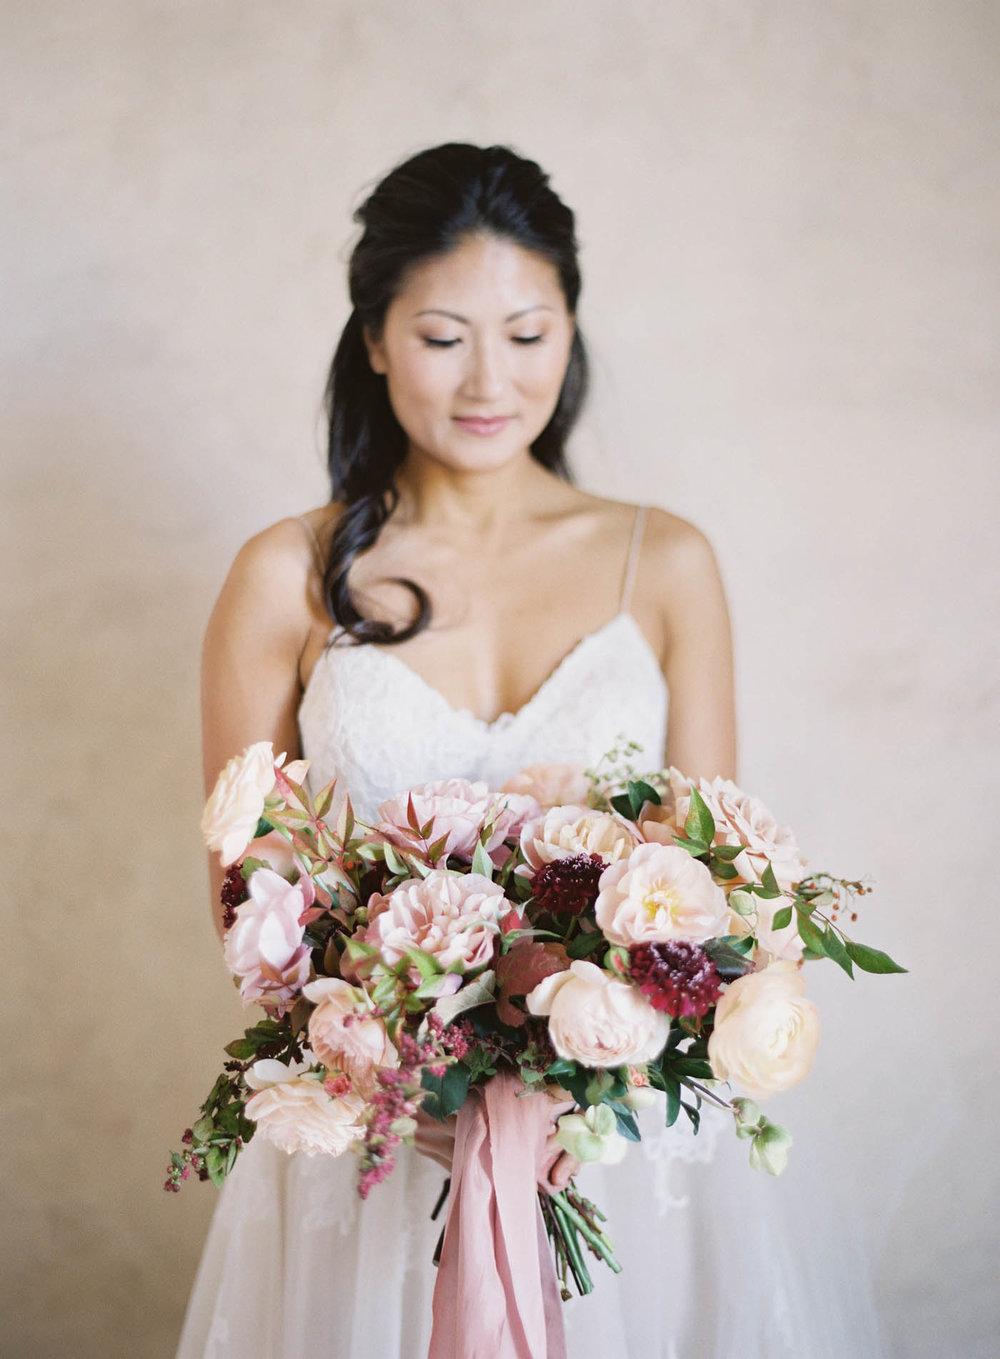 sunstone-villa-wedding-8-Jen_Huang-RD-30-Jen_Huang-009577-R1-012.jpg